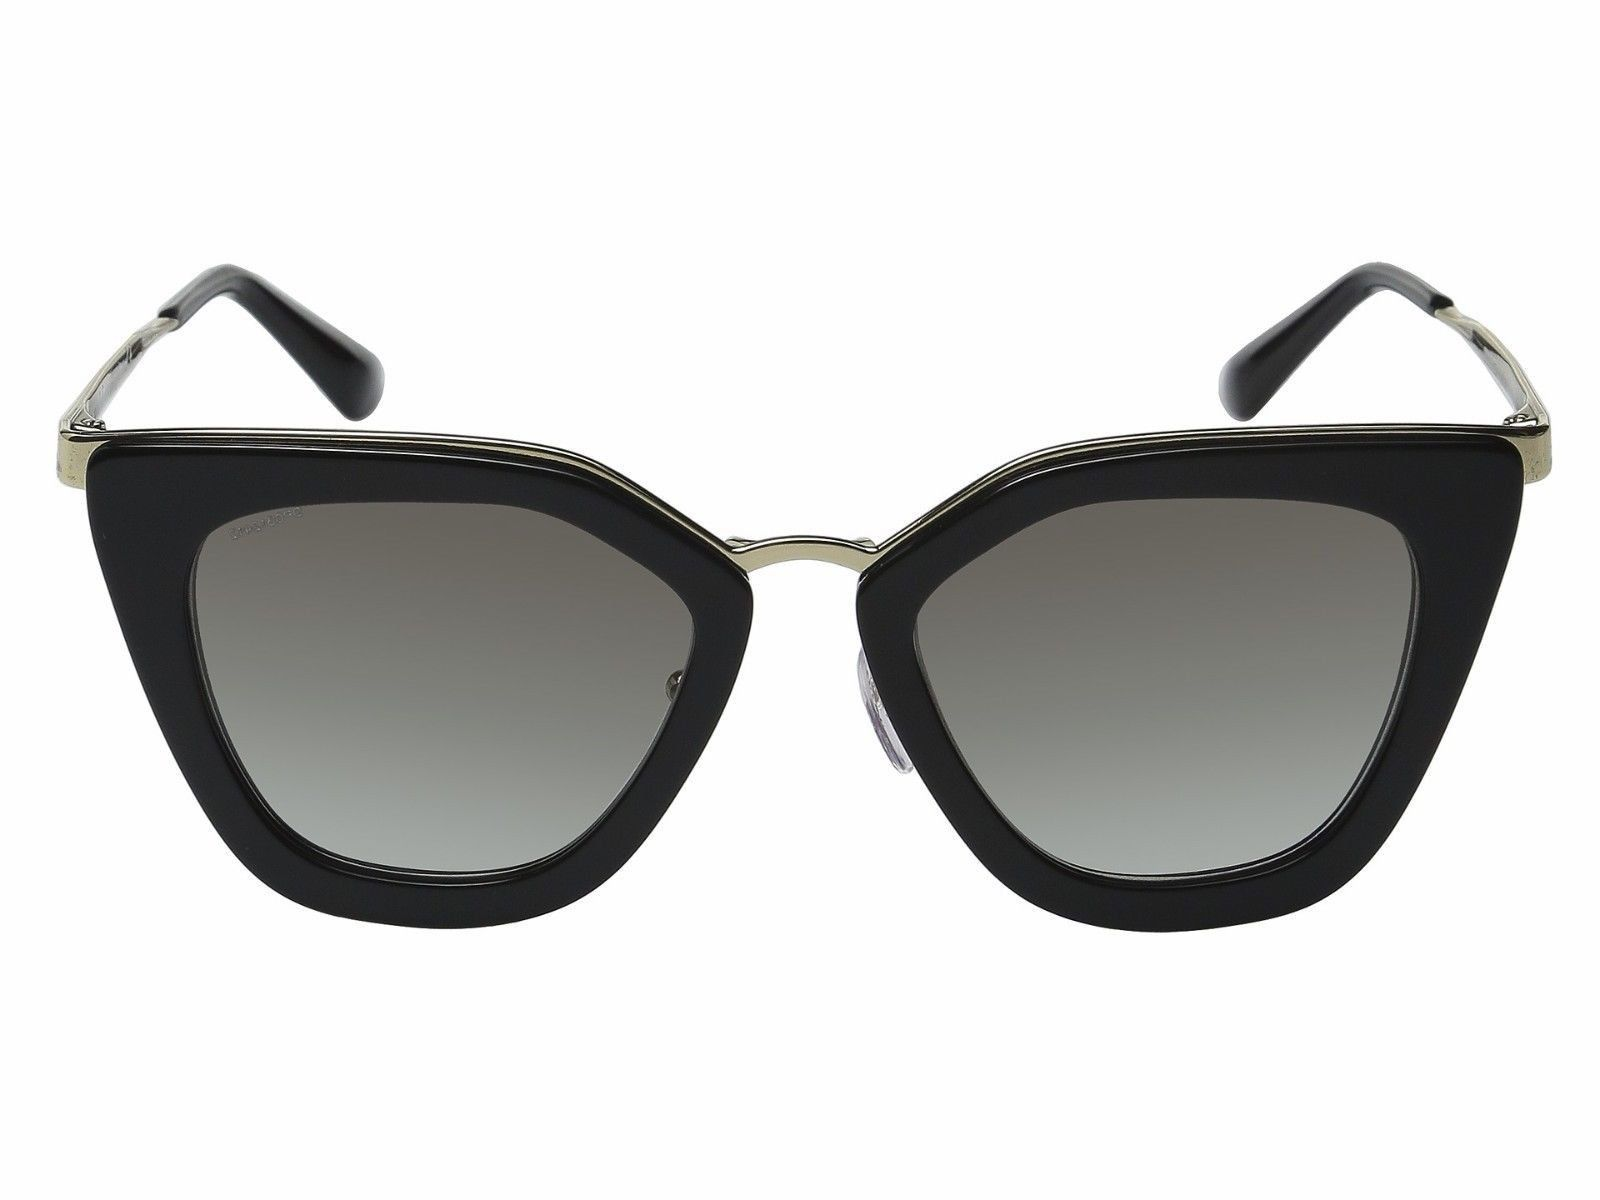 644c1d4368df2 NWT Prada Sunglasses SPR 53S 1AB-0A7 Black Gold   Gray Gradient 52 mm NIB